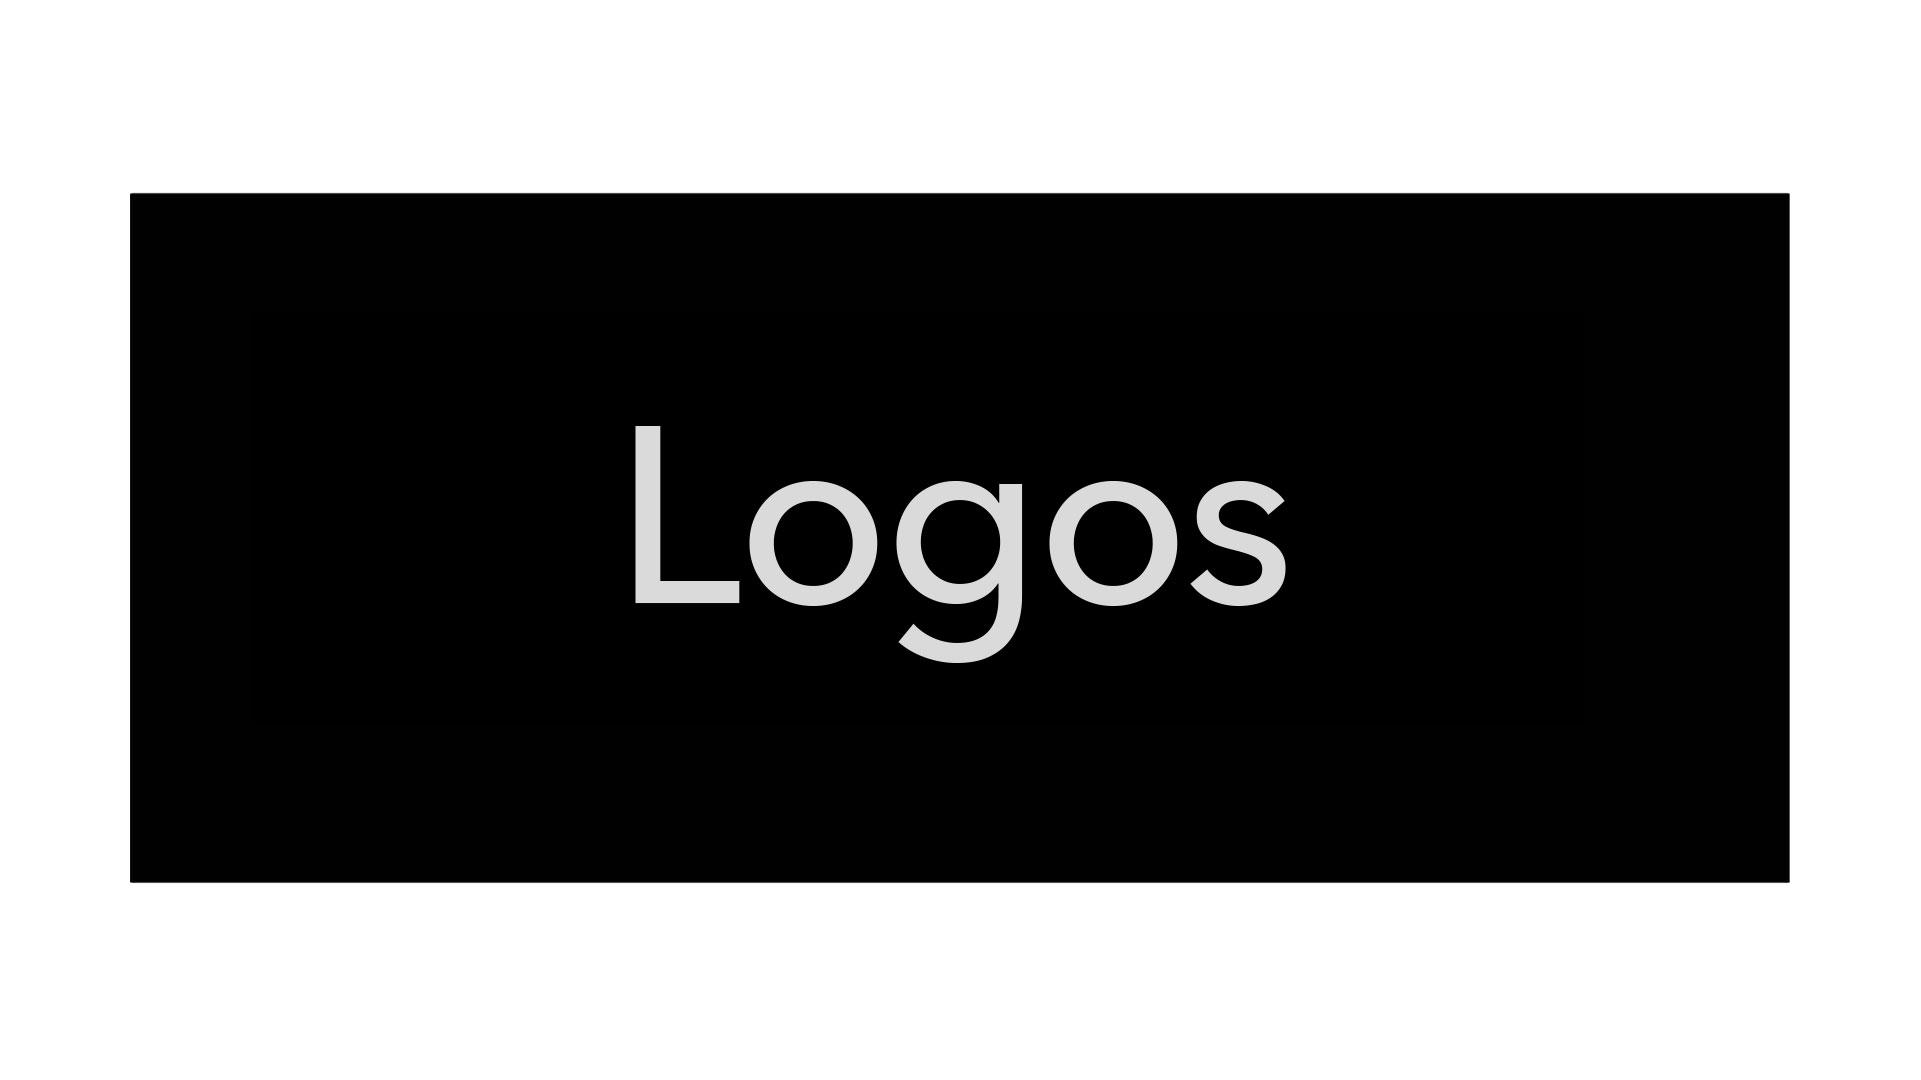 logos-dark